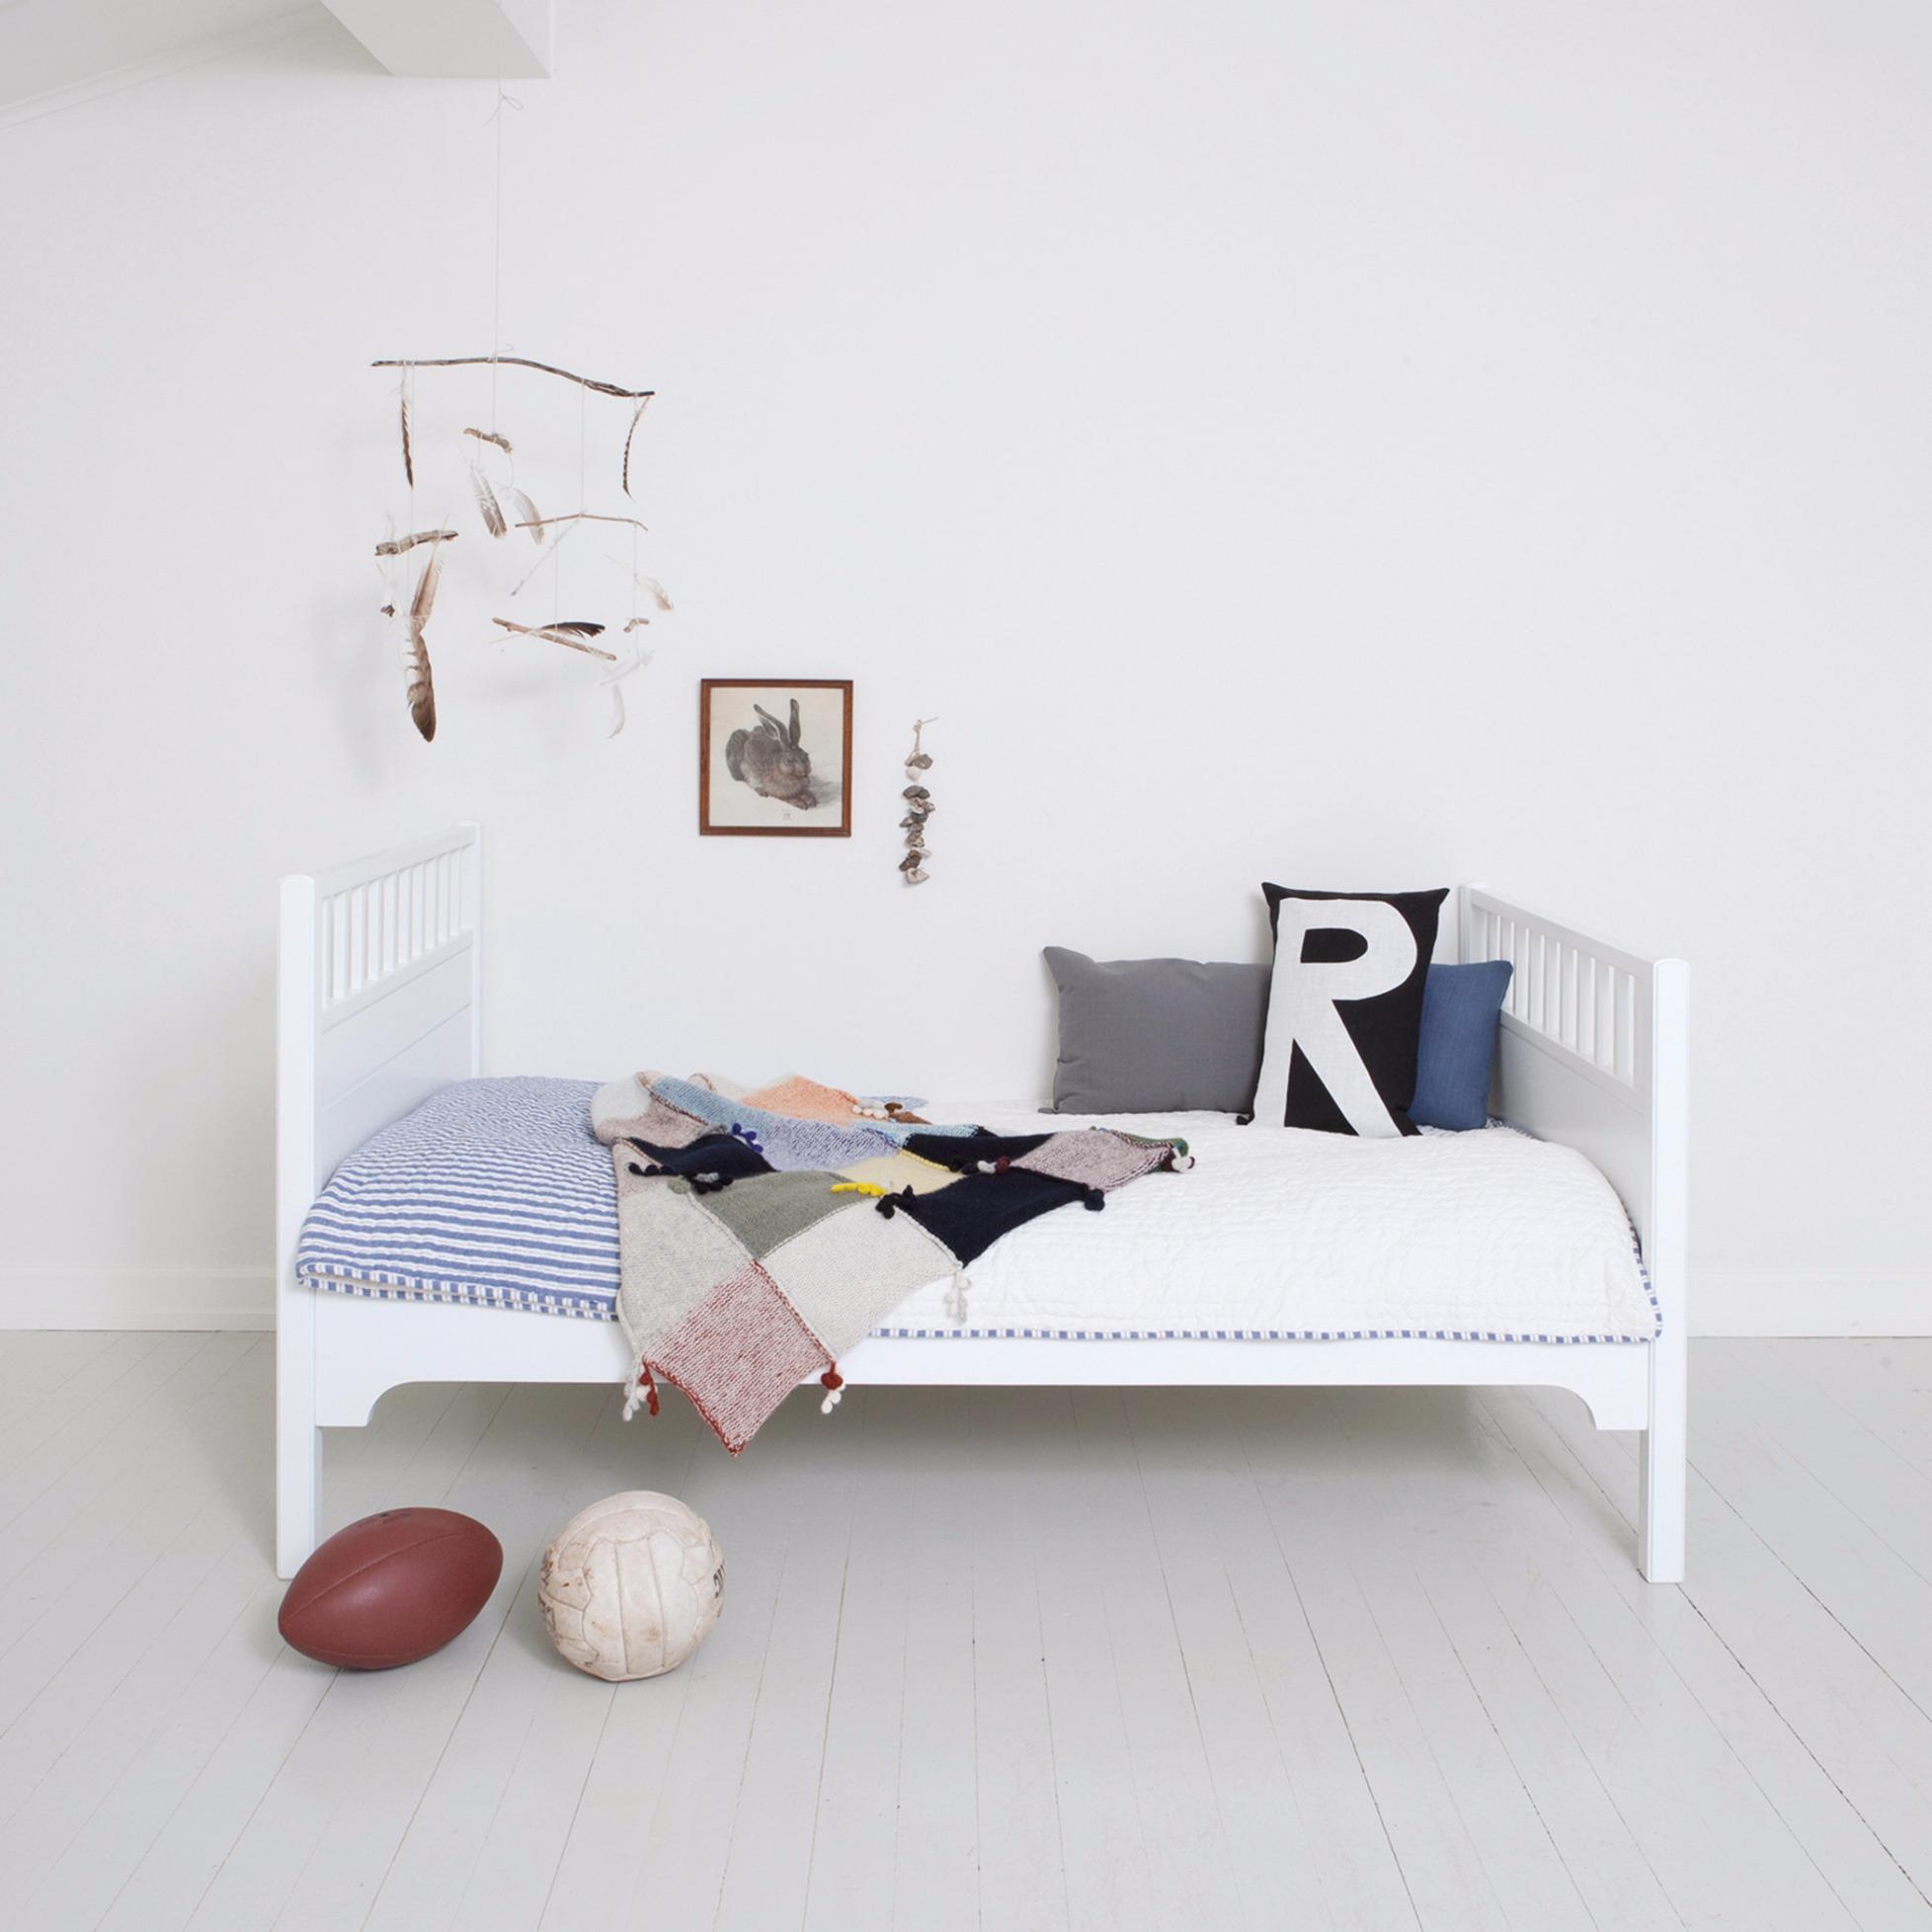 junior und kinderbett seaside von oliver furniture. Black Bedroom Furniture Sets. Home Design Ideas